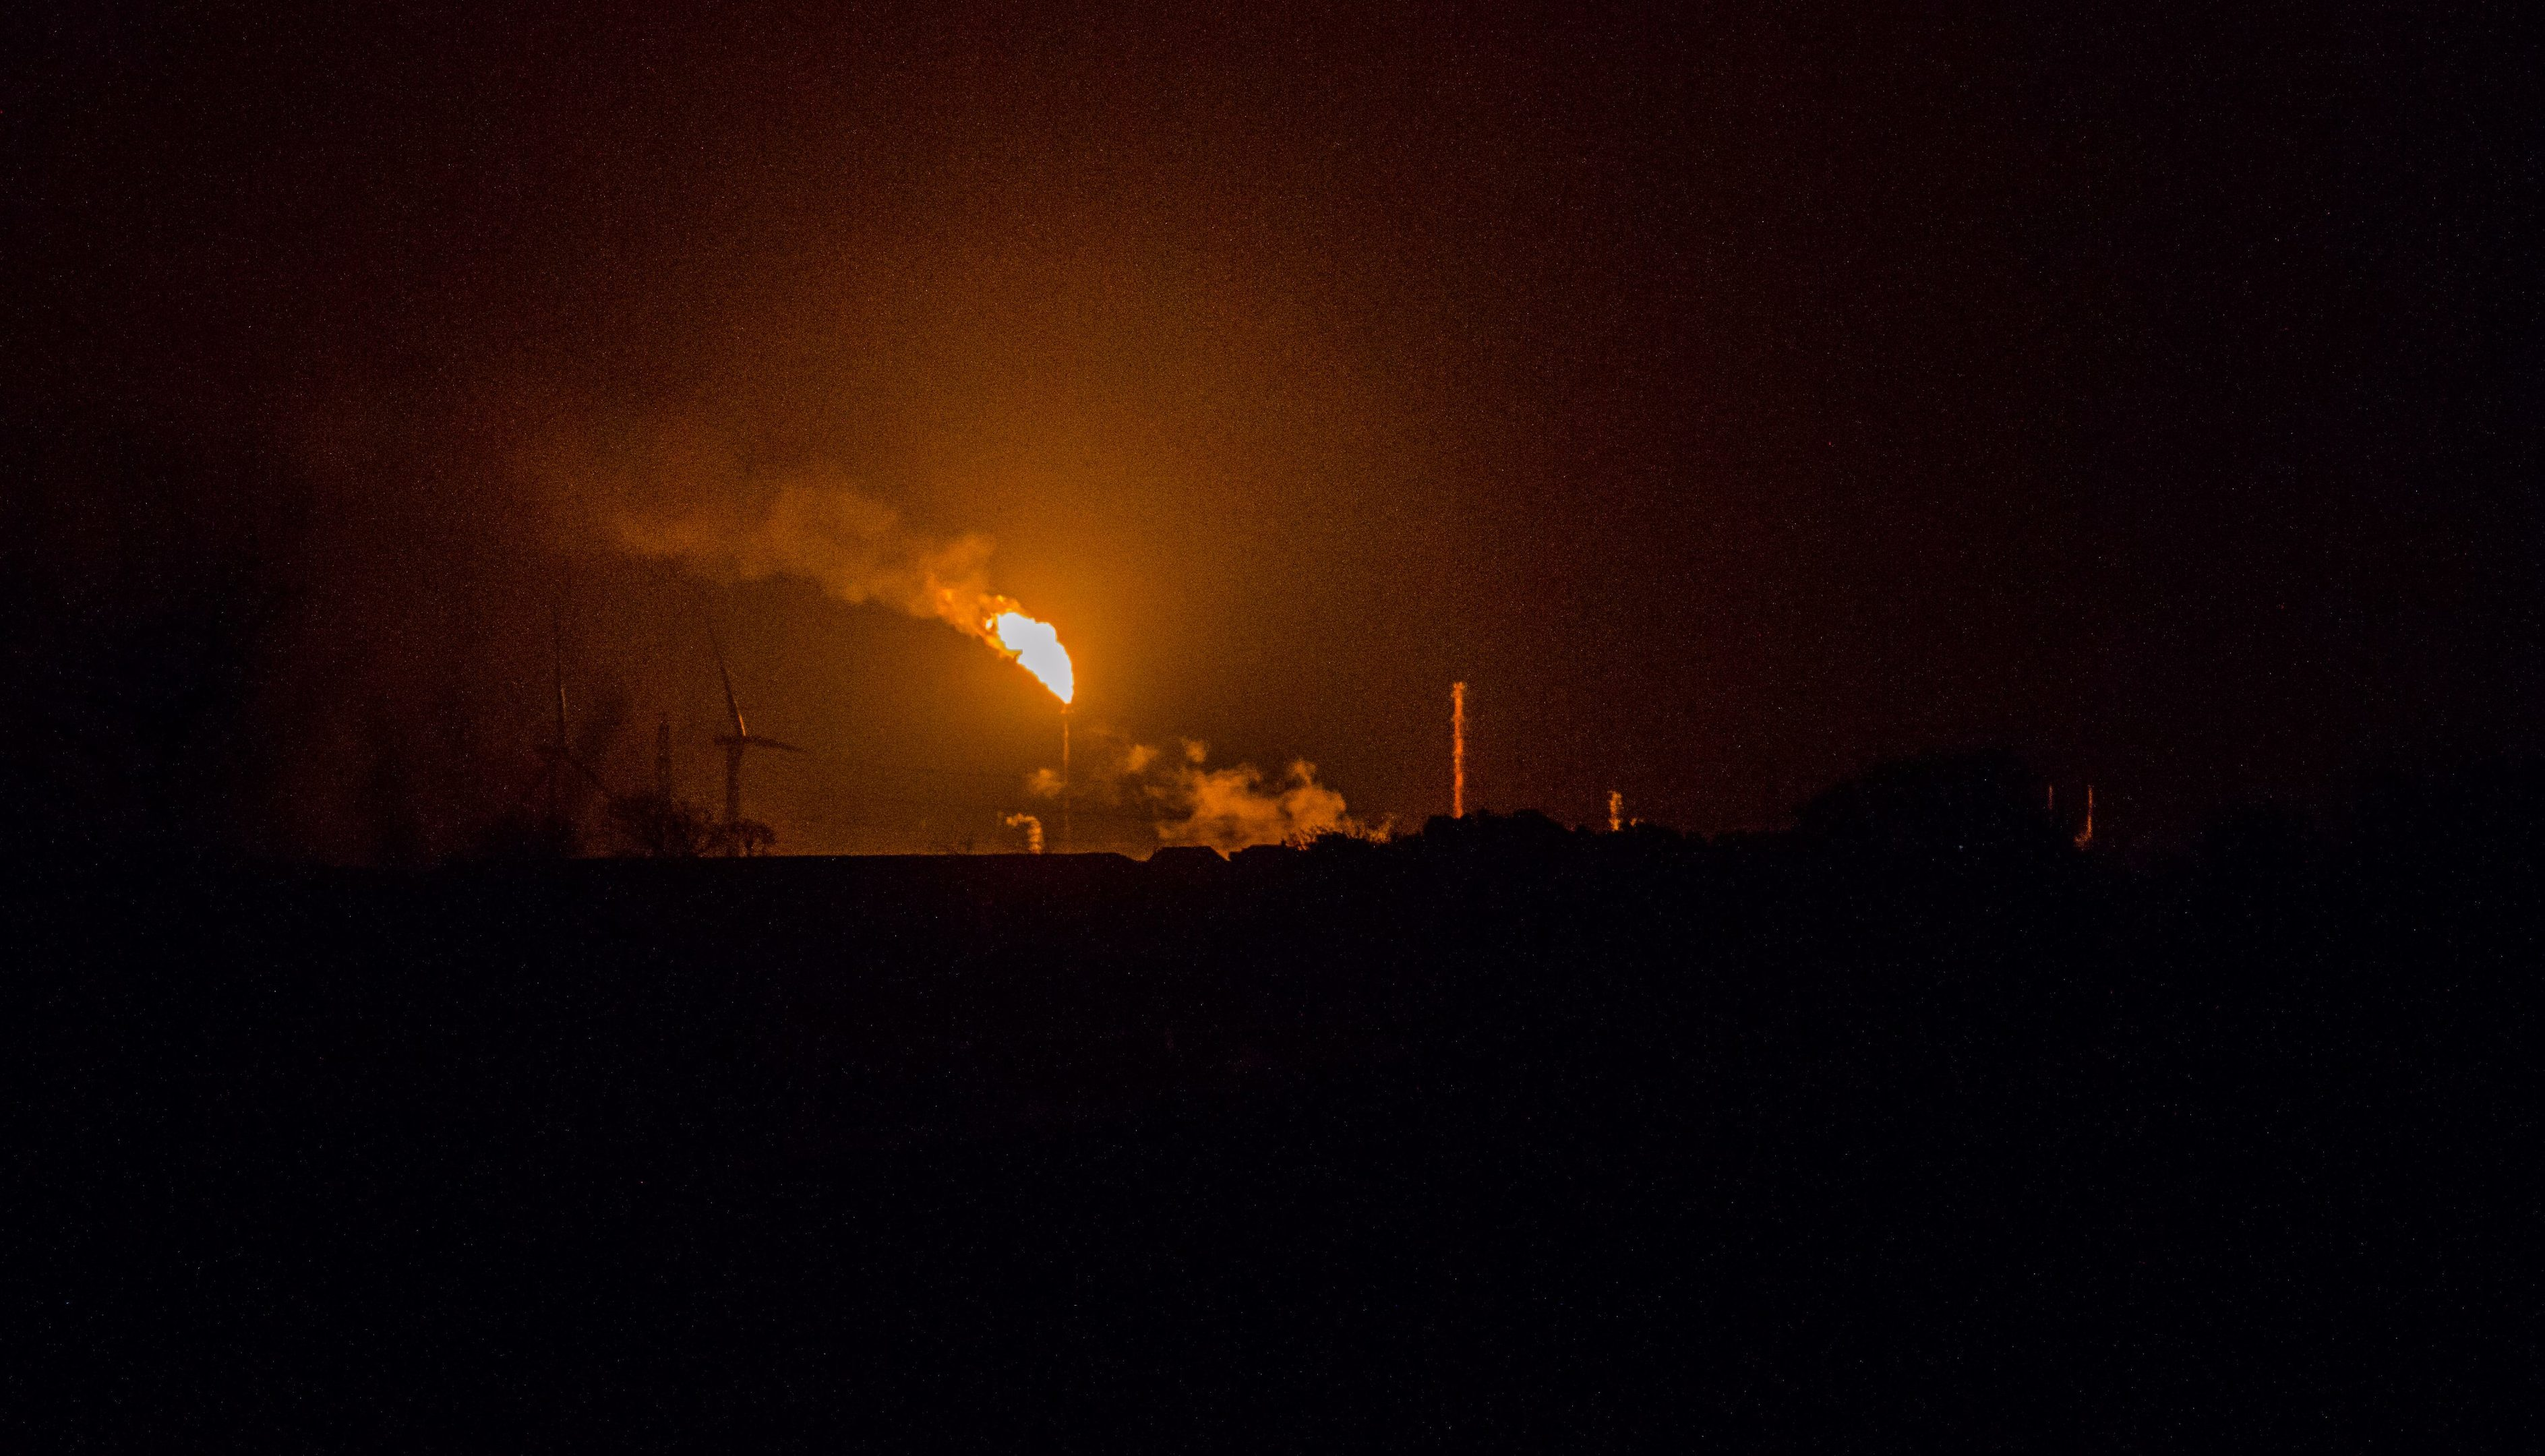 Flares from Mossmorran near Cowdenbeath this weekend.